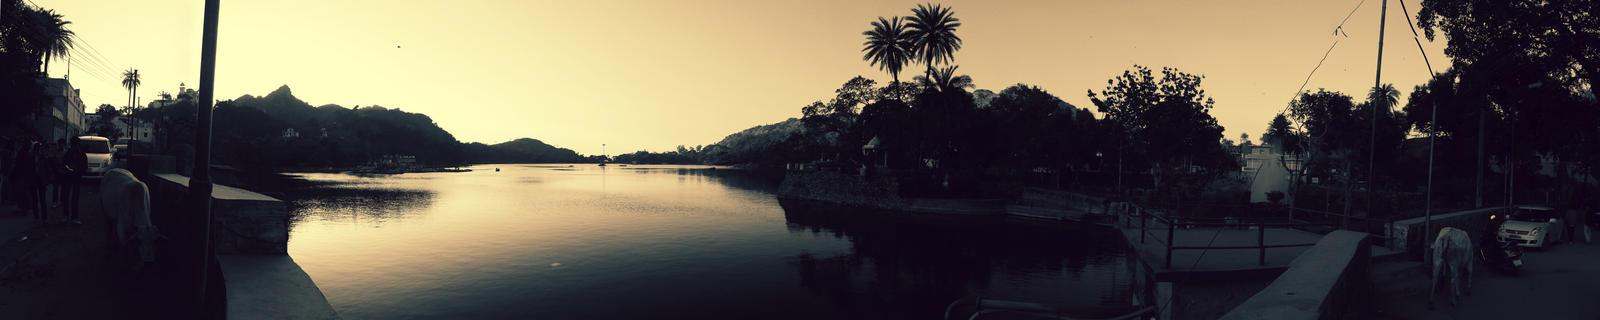 Nakki Lake, Mount Abu by faithlessdream